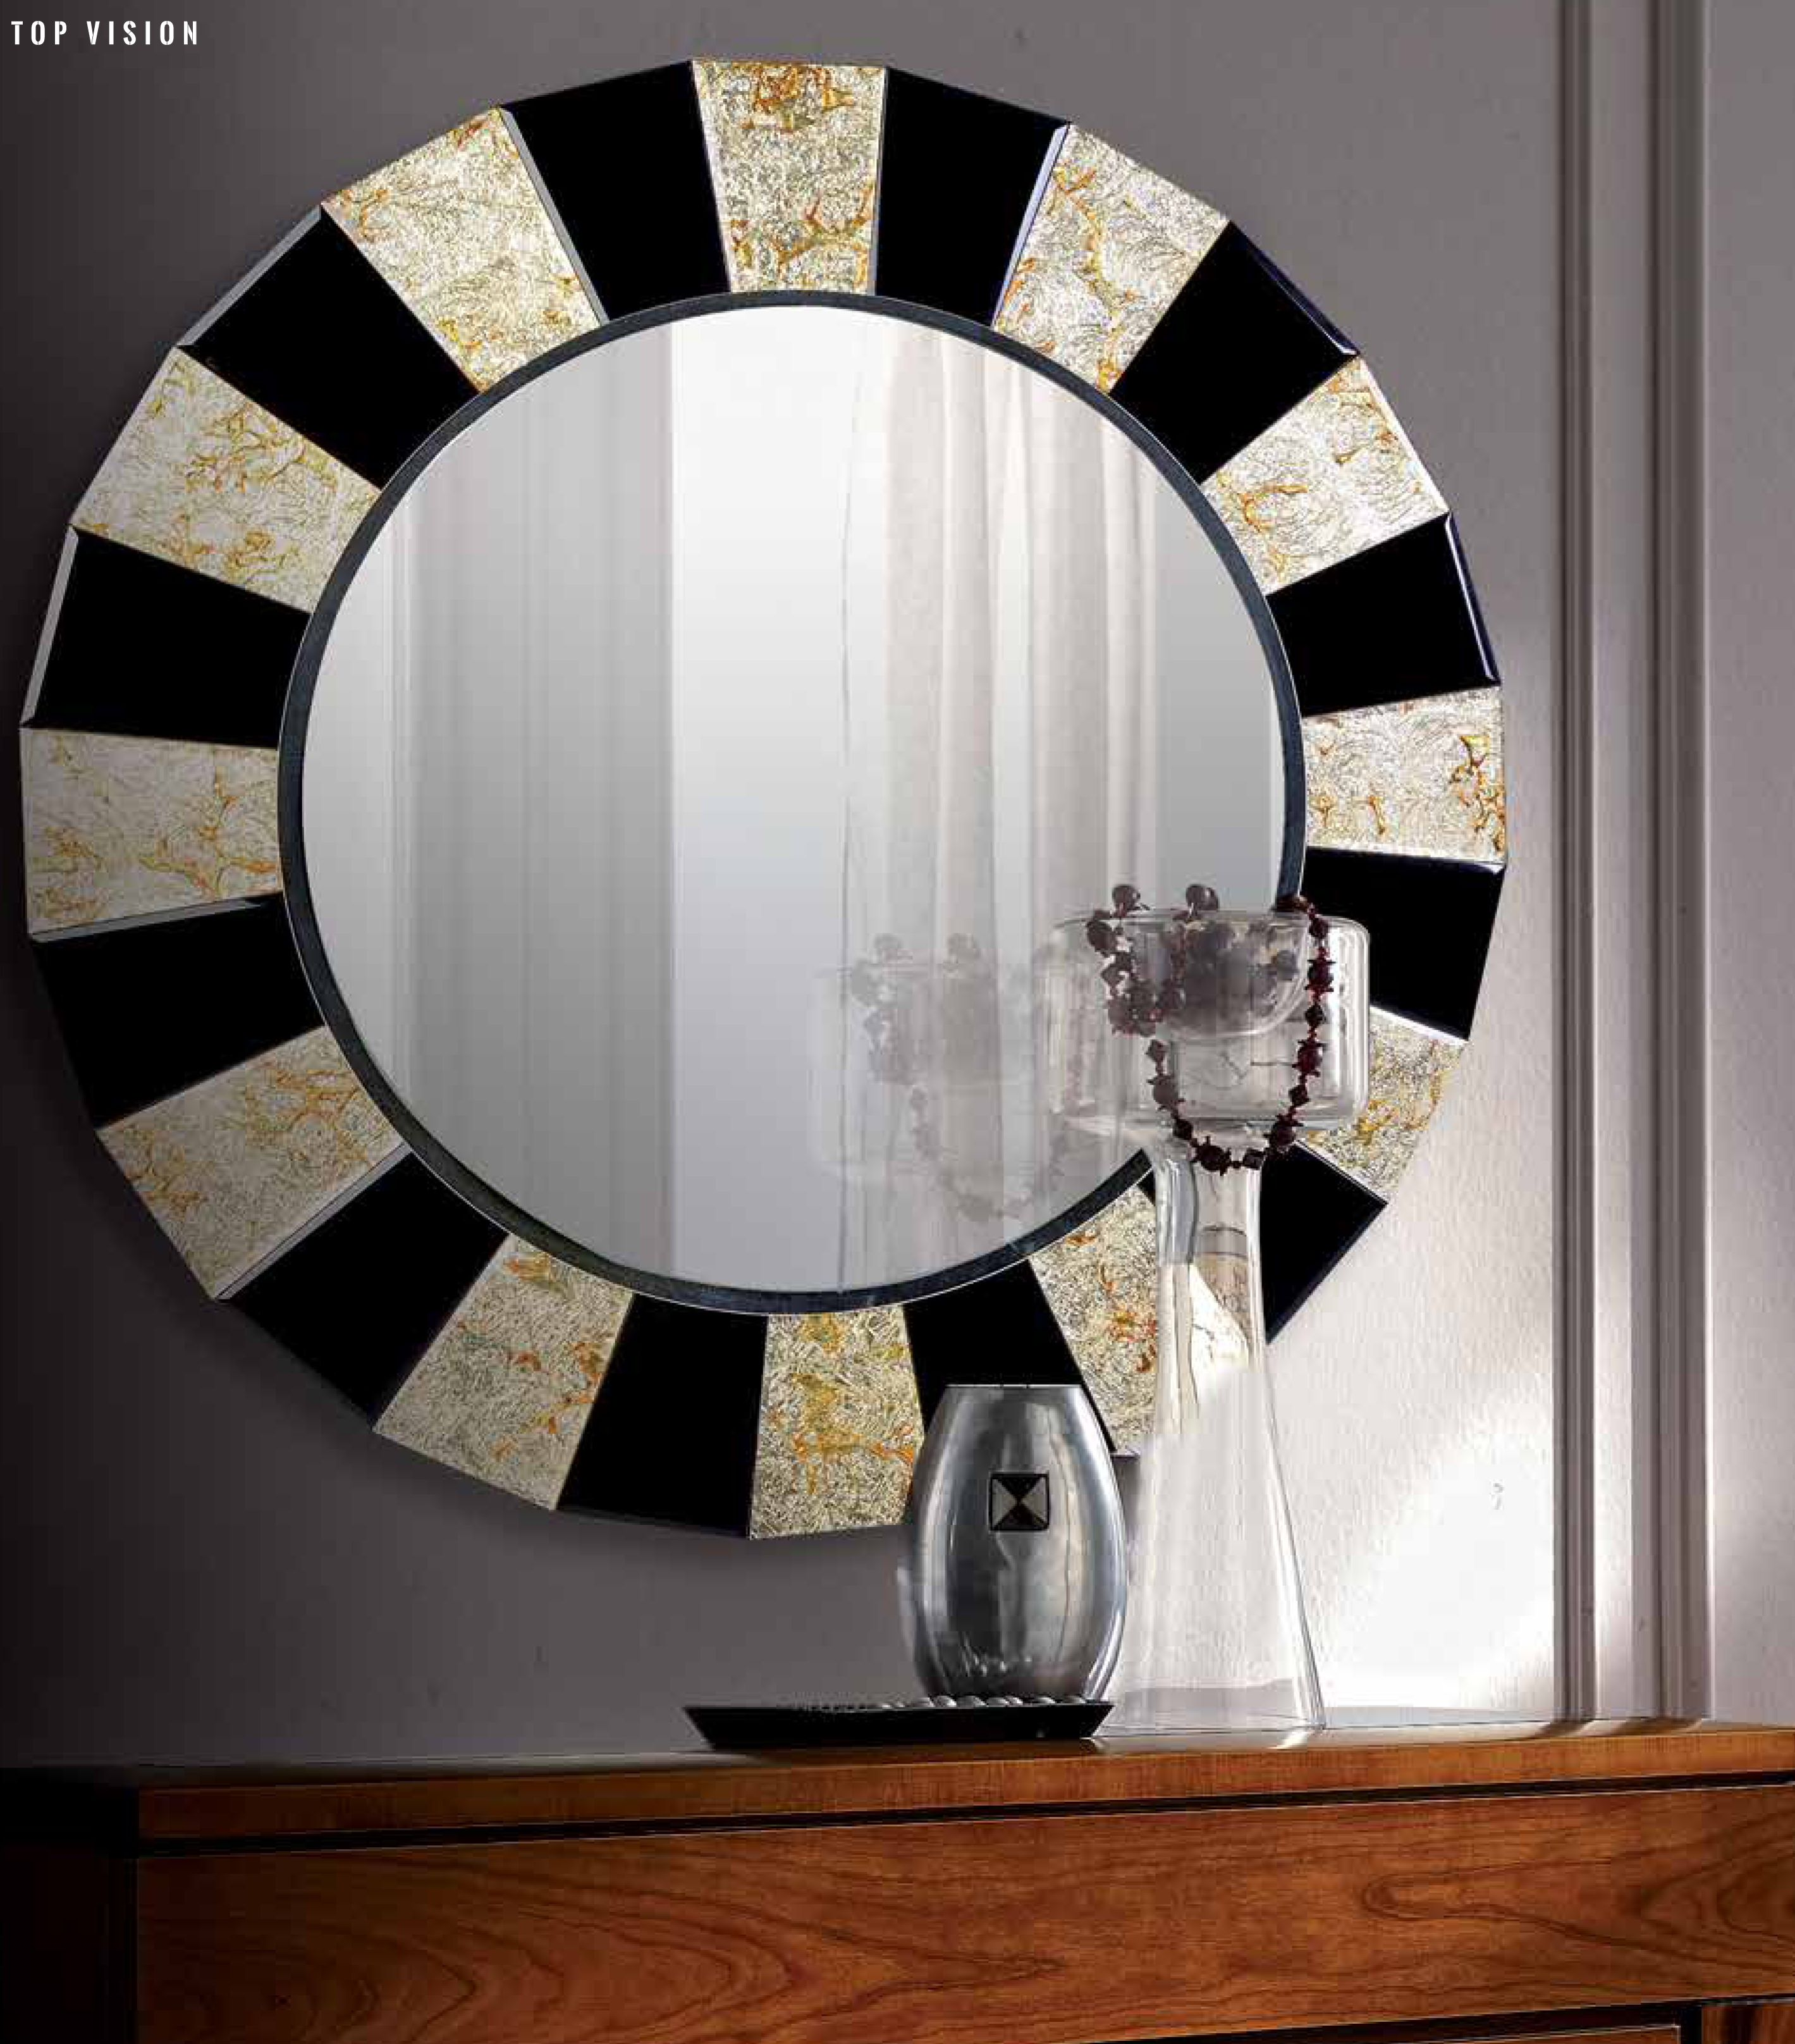 Espejo Redondo Espejo Moderno Espejo Circular Bicolor Espejo  # Muebles Giner Y Colomer